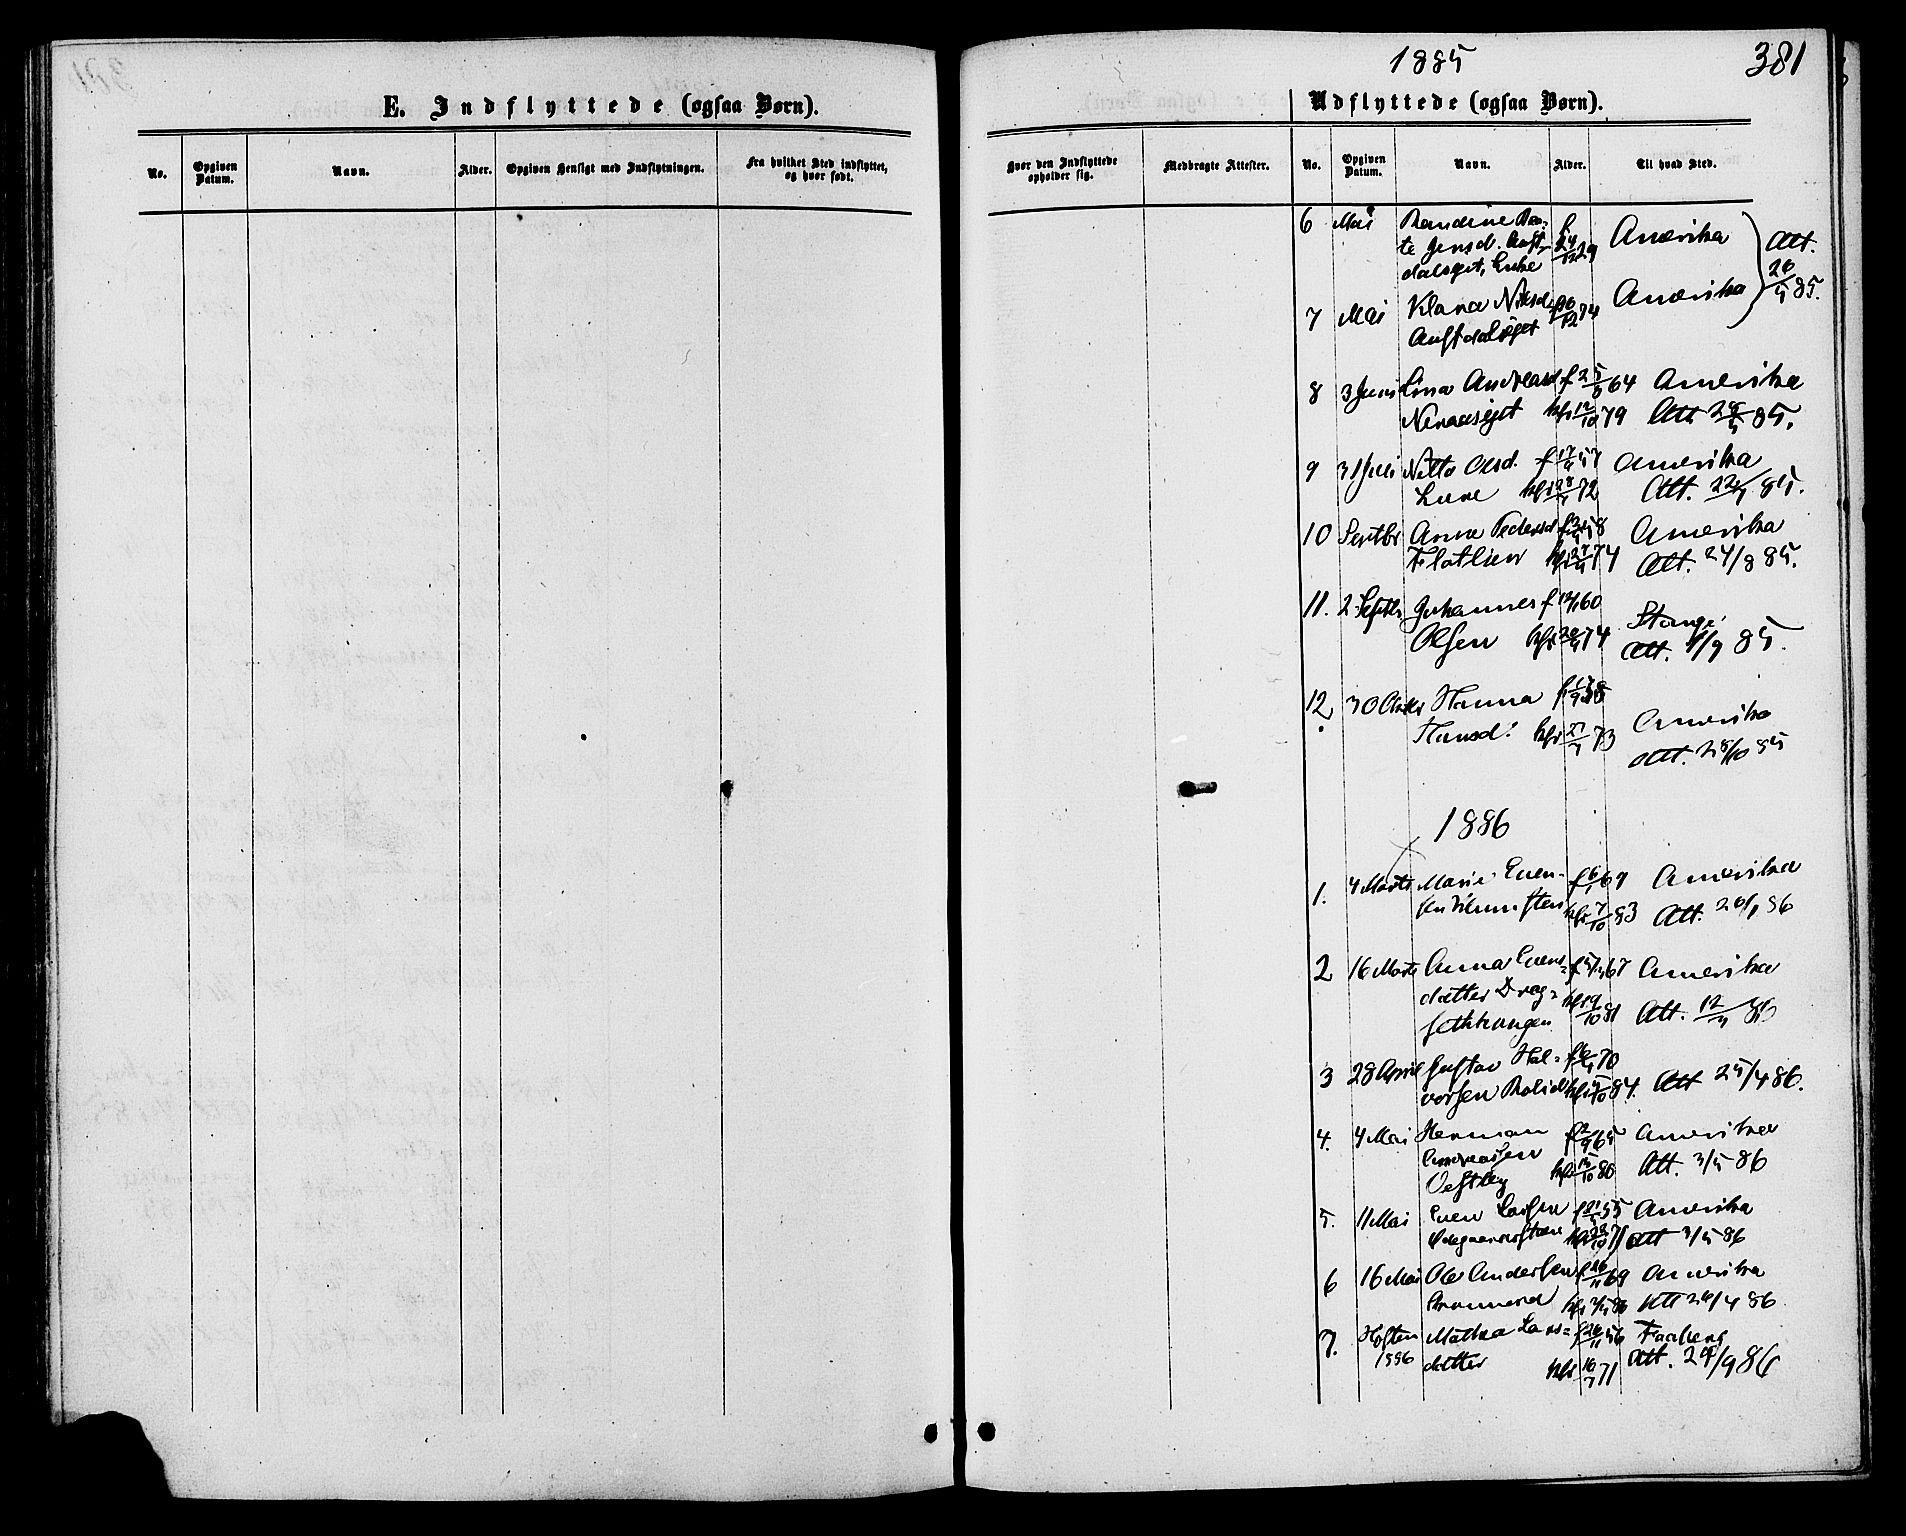 SAH, Biri prestekontor, Ministerialbok nr. 6, 1877-1886, s. 381